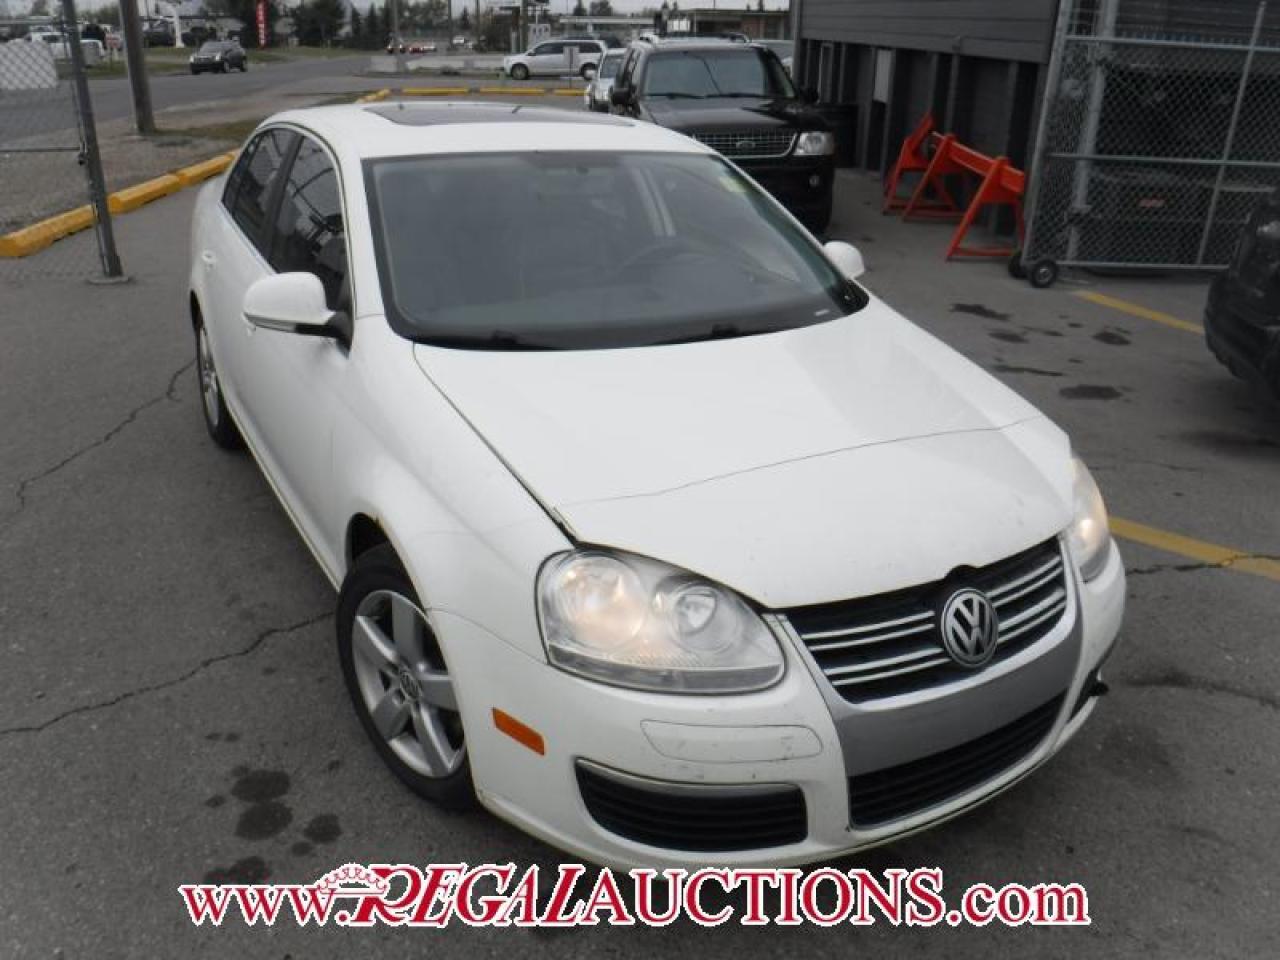 Photo of White 2008 Volkswagen Jetta